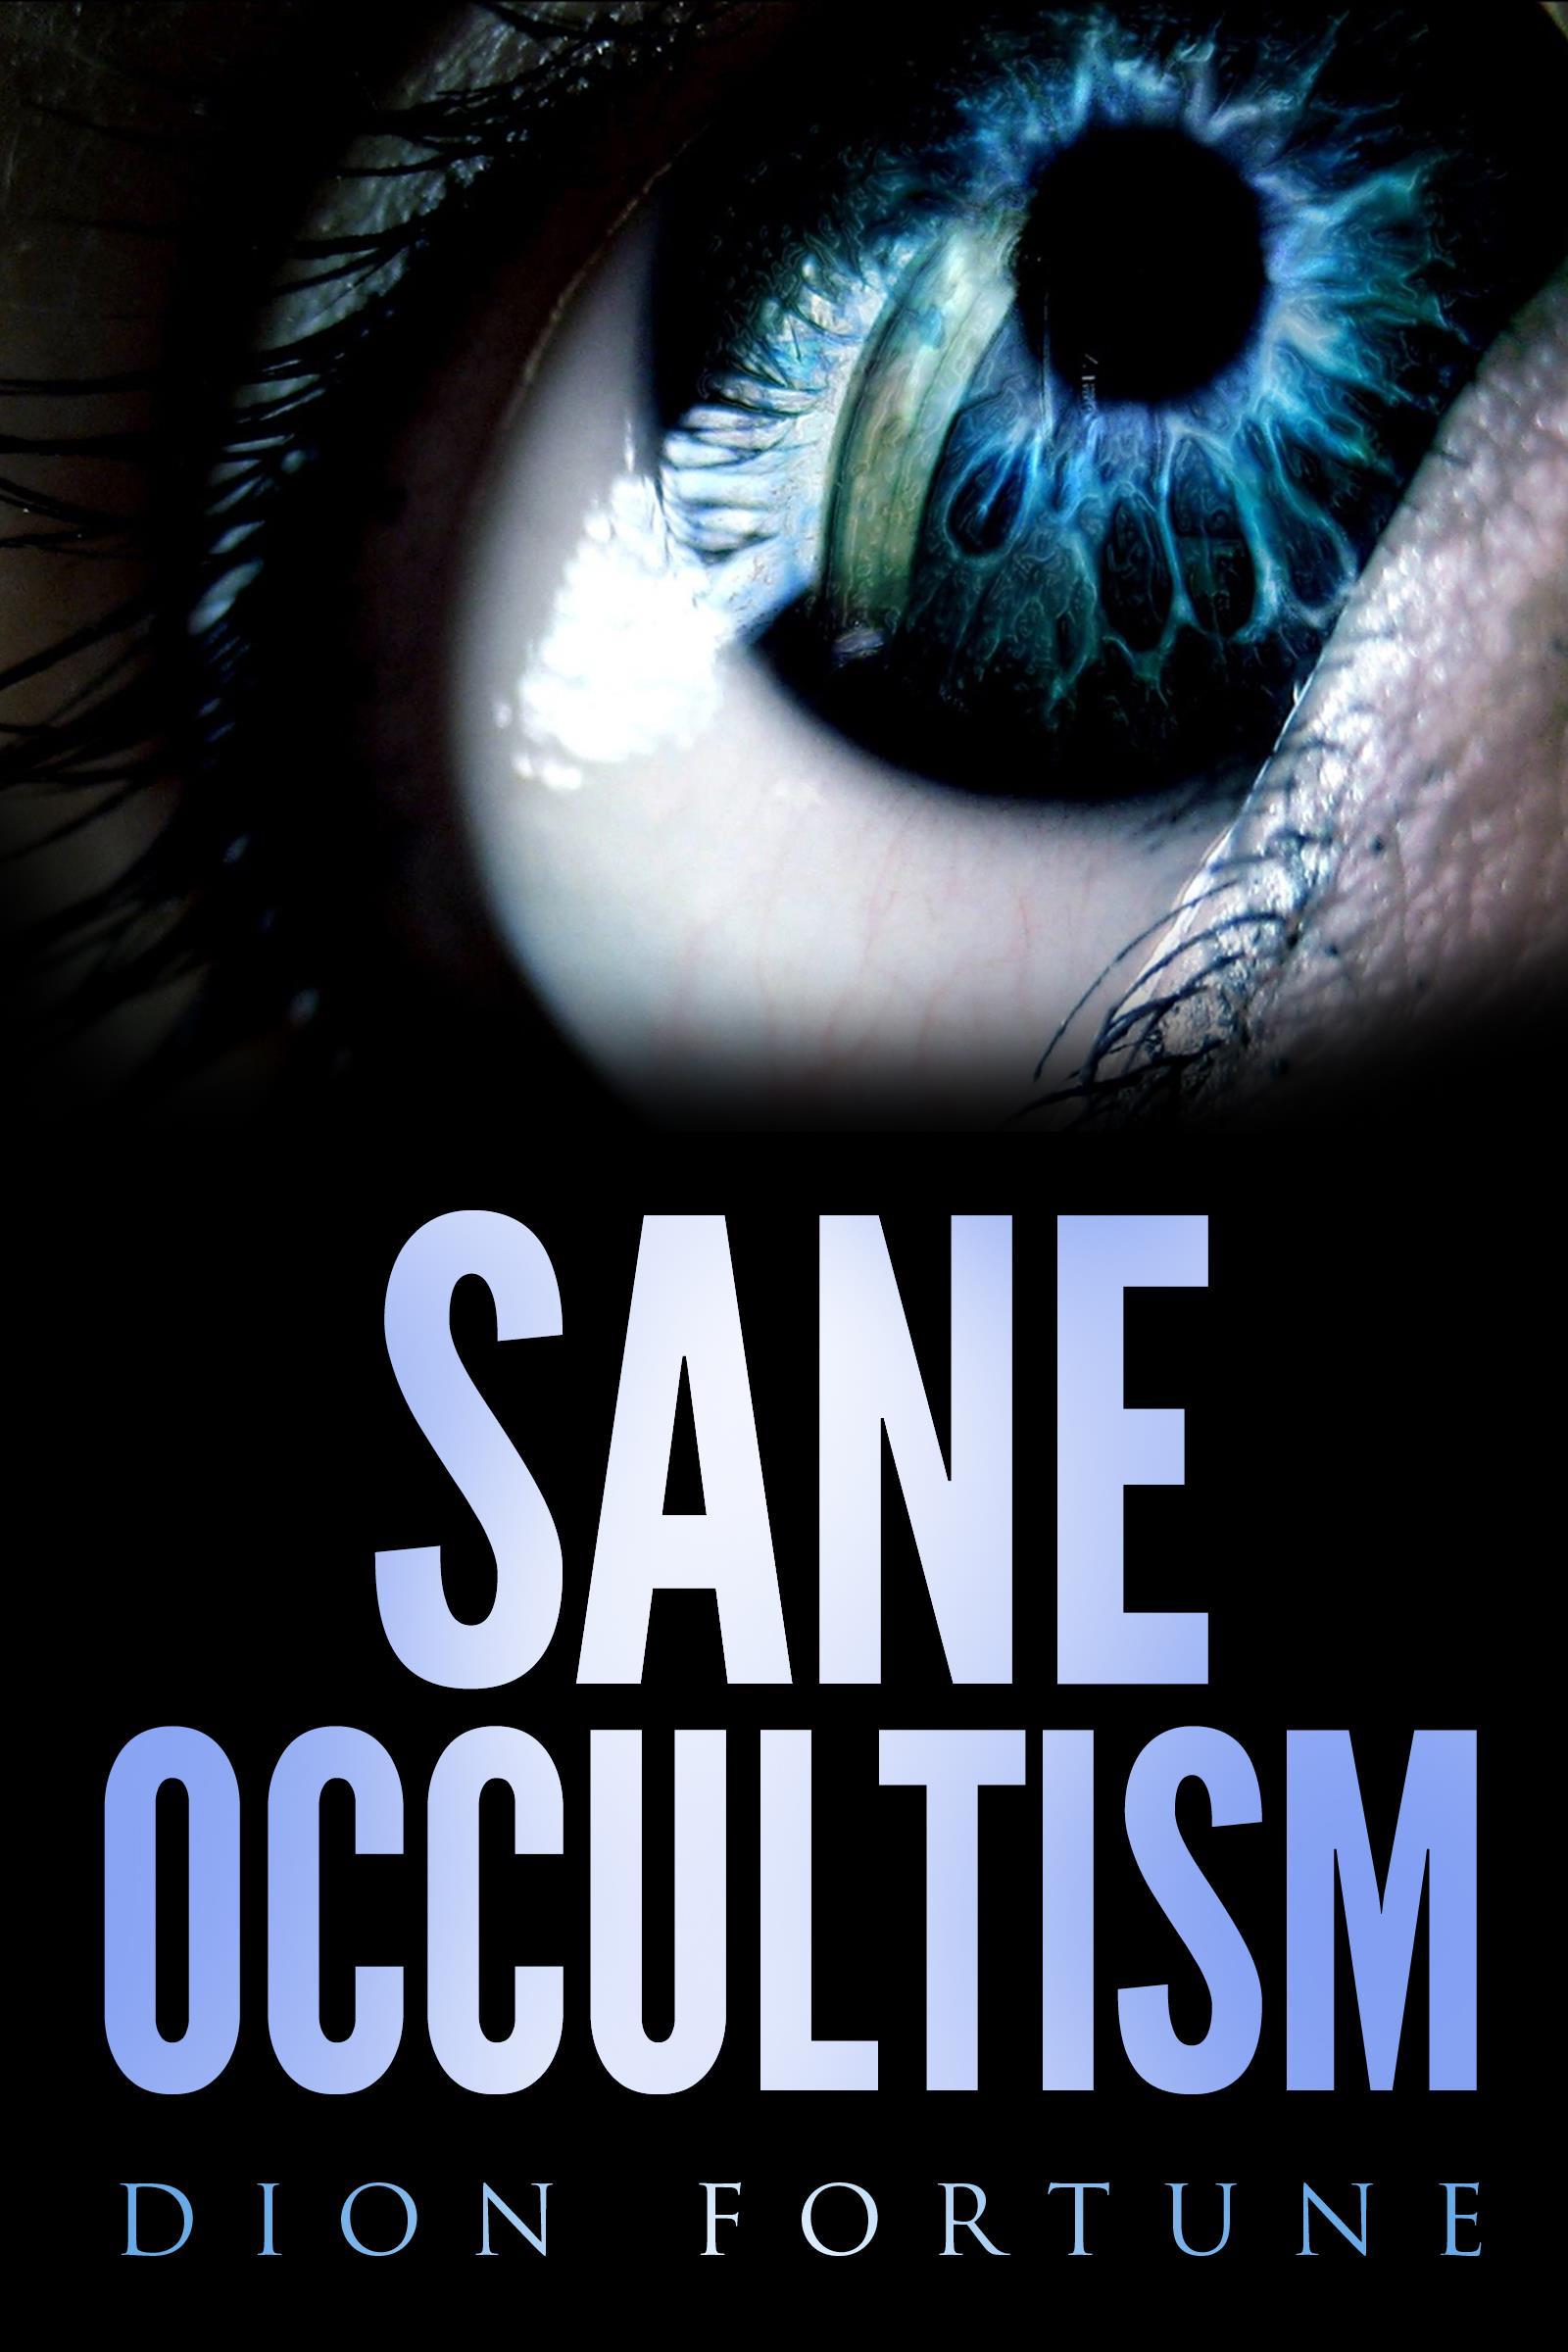 Sane Occultism